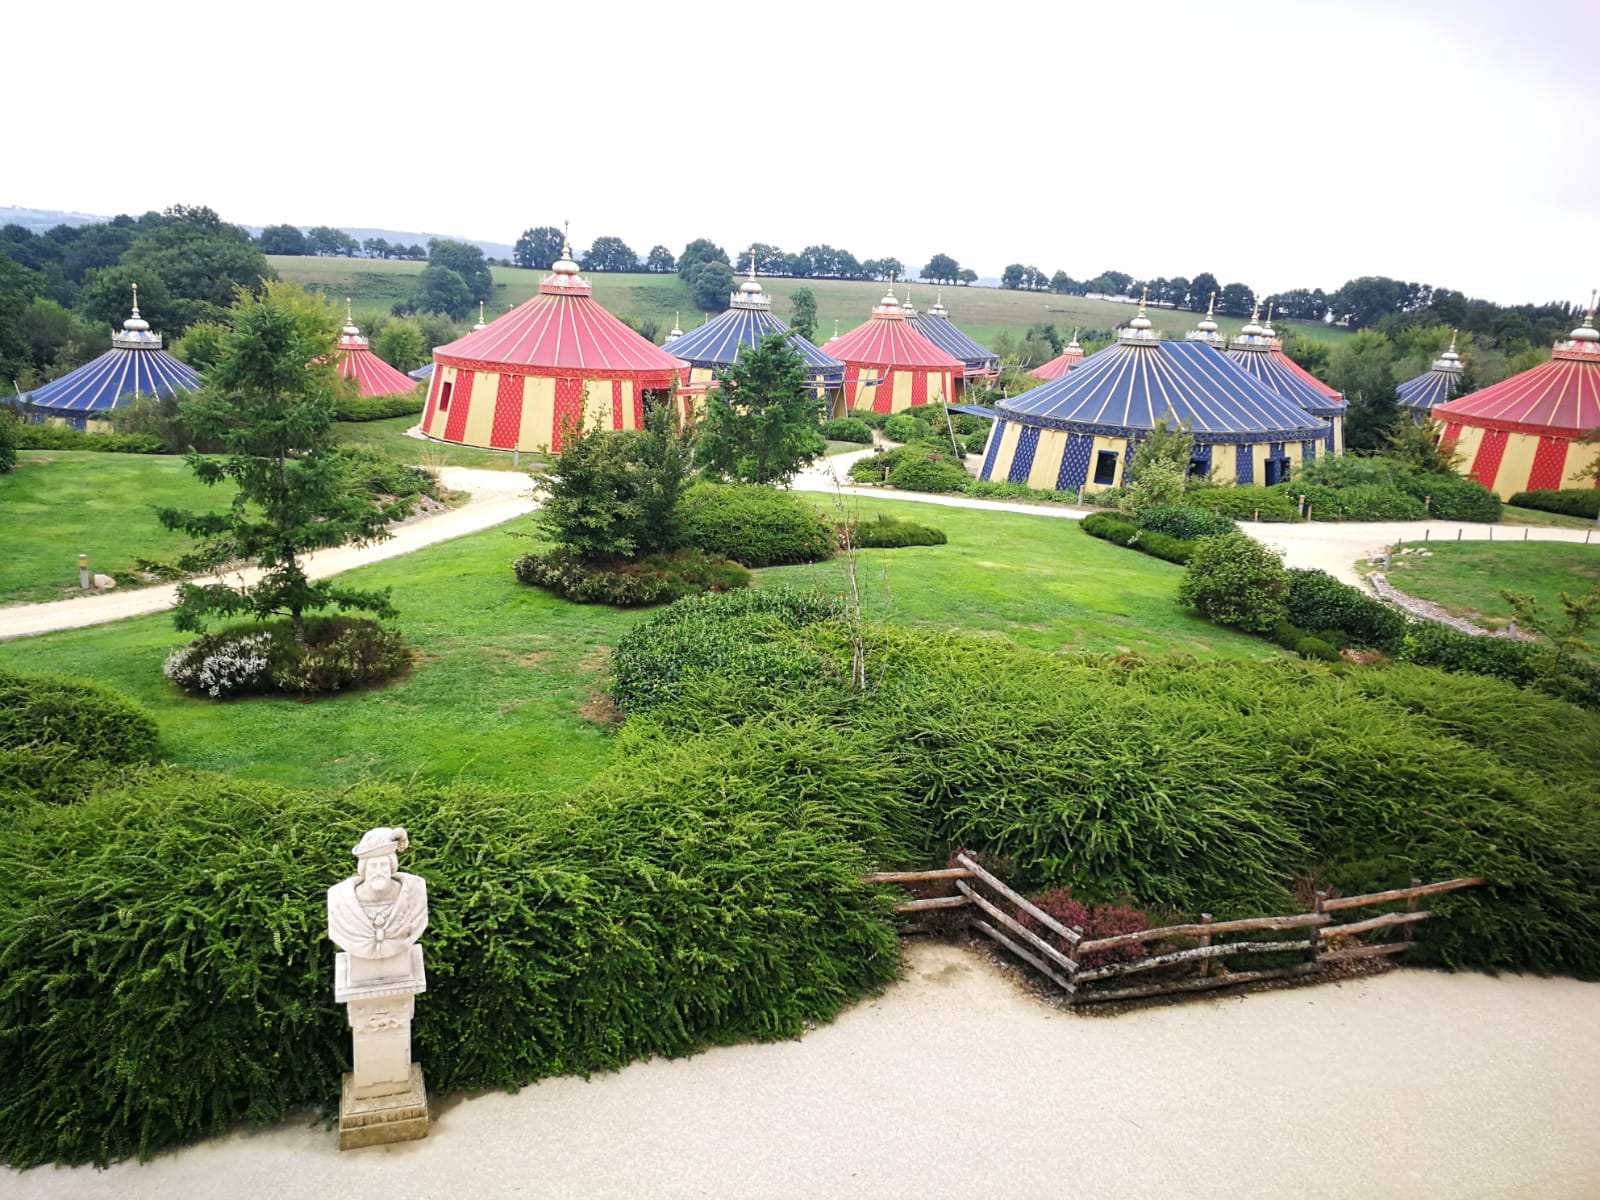 overnachten bij Puy du fou Le Camp du Drap d'Or hotel romeinse tent geschiedenispark frankijk